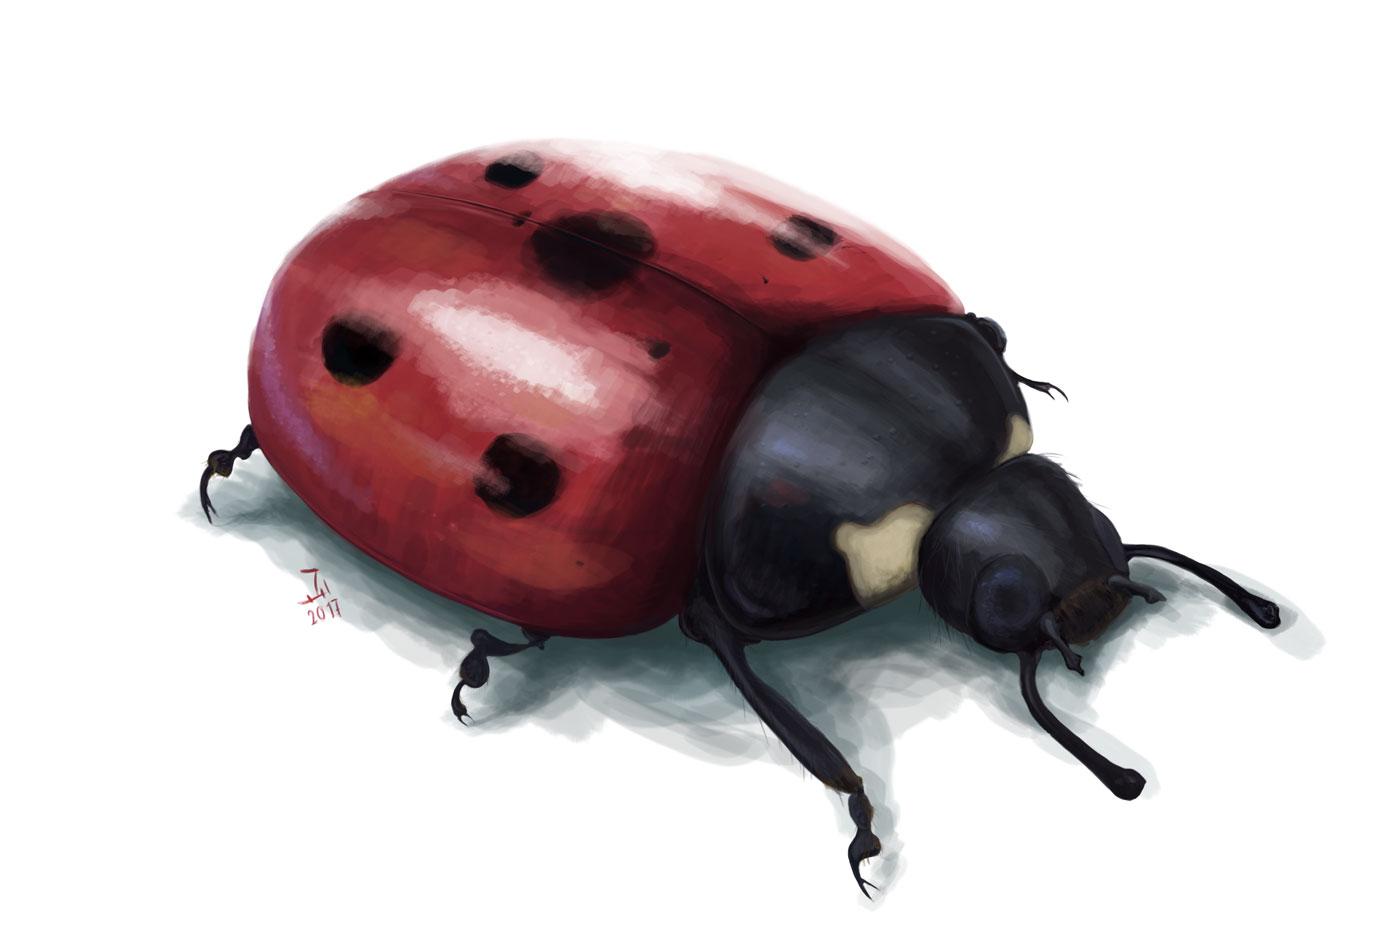 ladybug exercise - photoshop practice